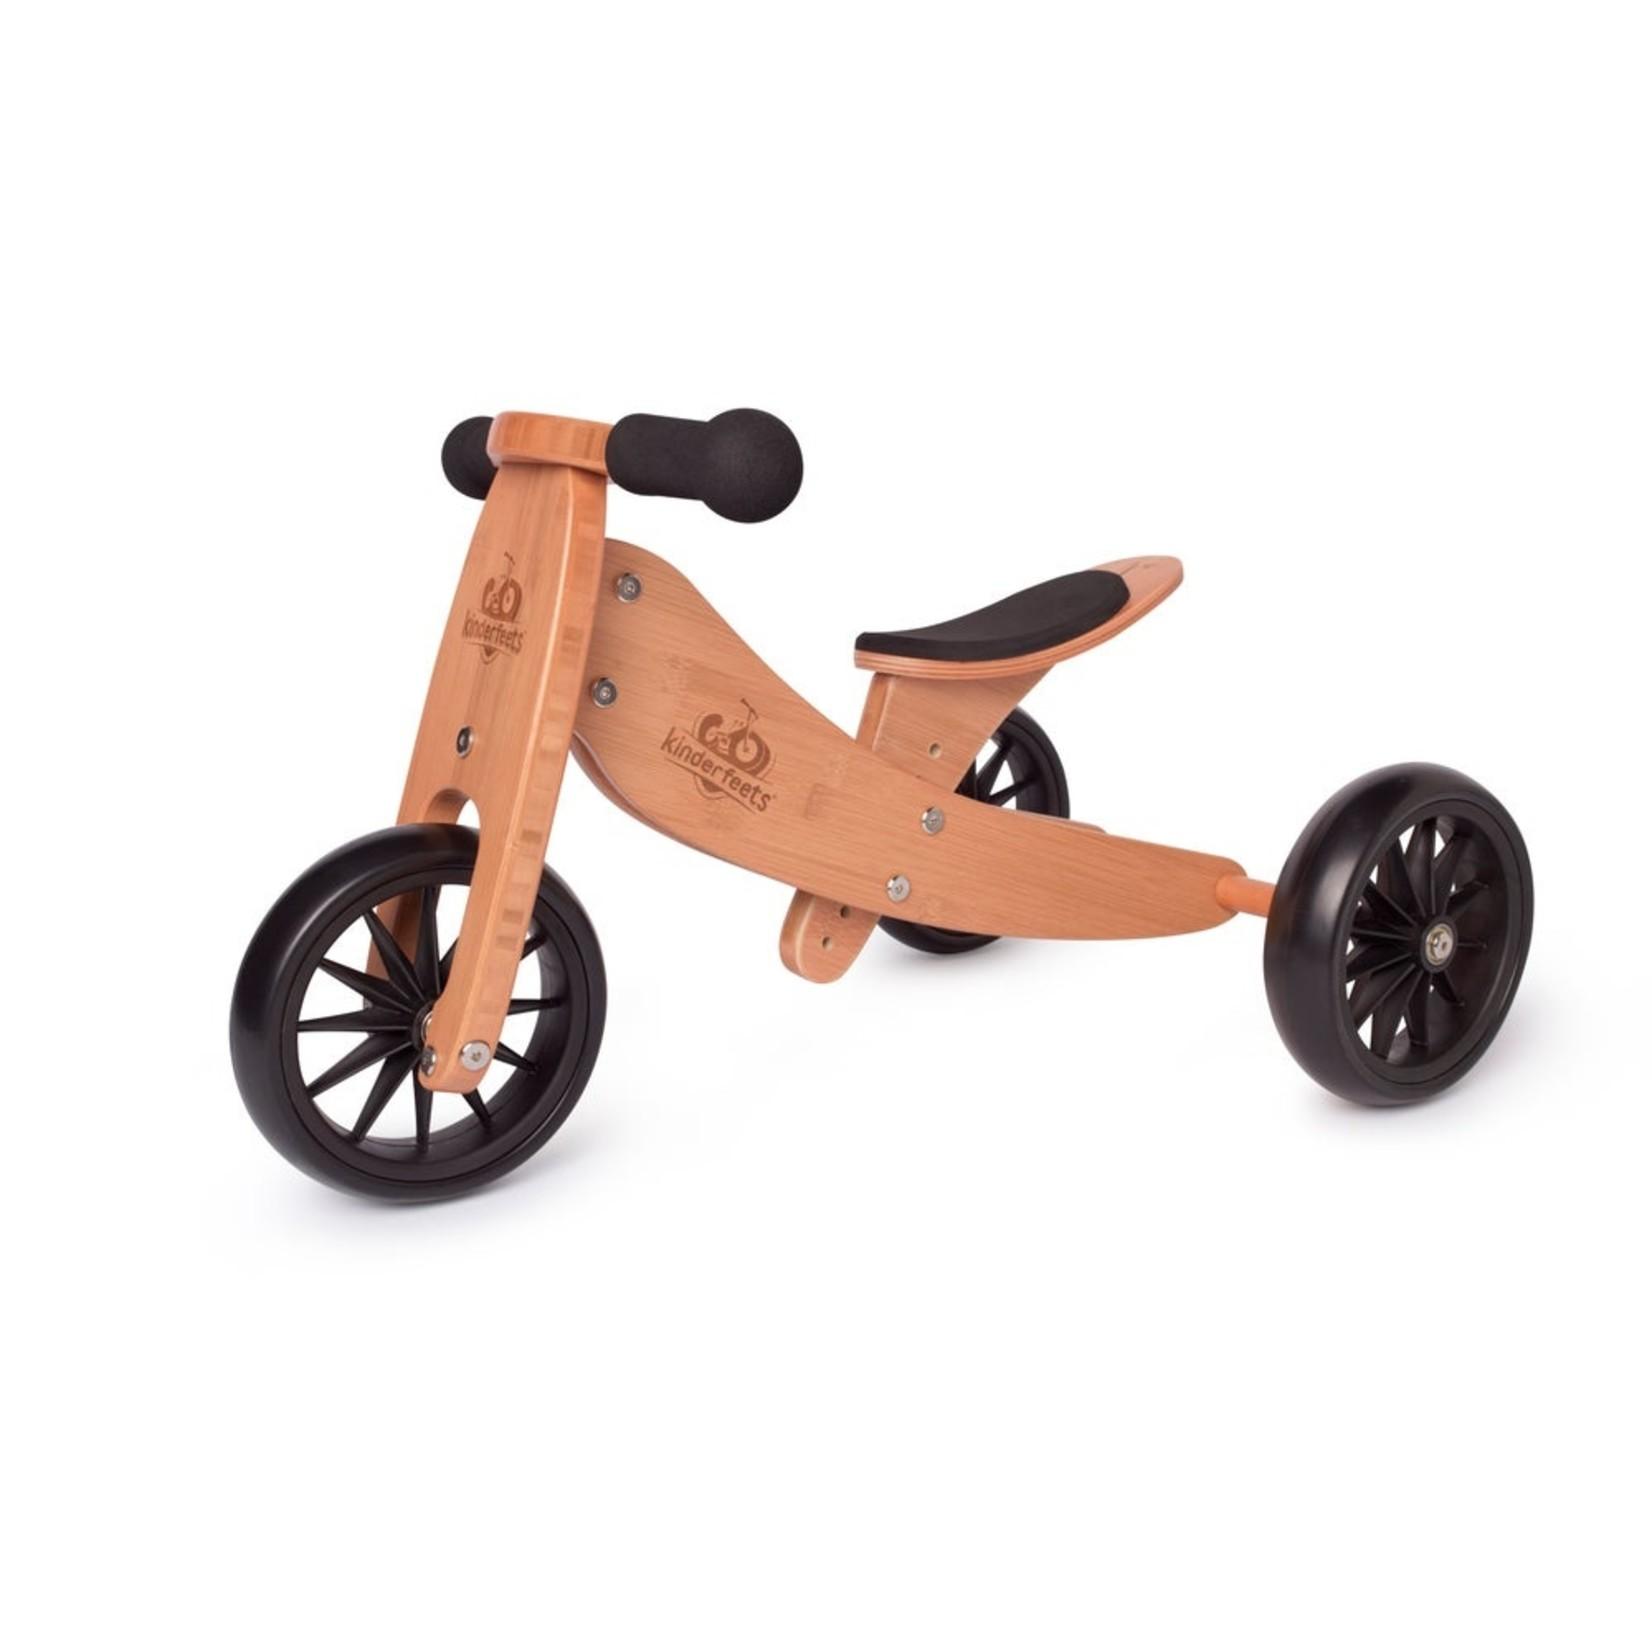 Kinderfeets Kinderfeets, 2-in-1 Trike/Bike Bamboo